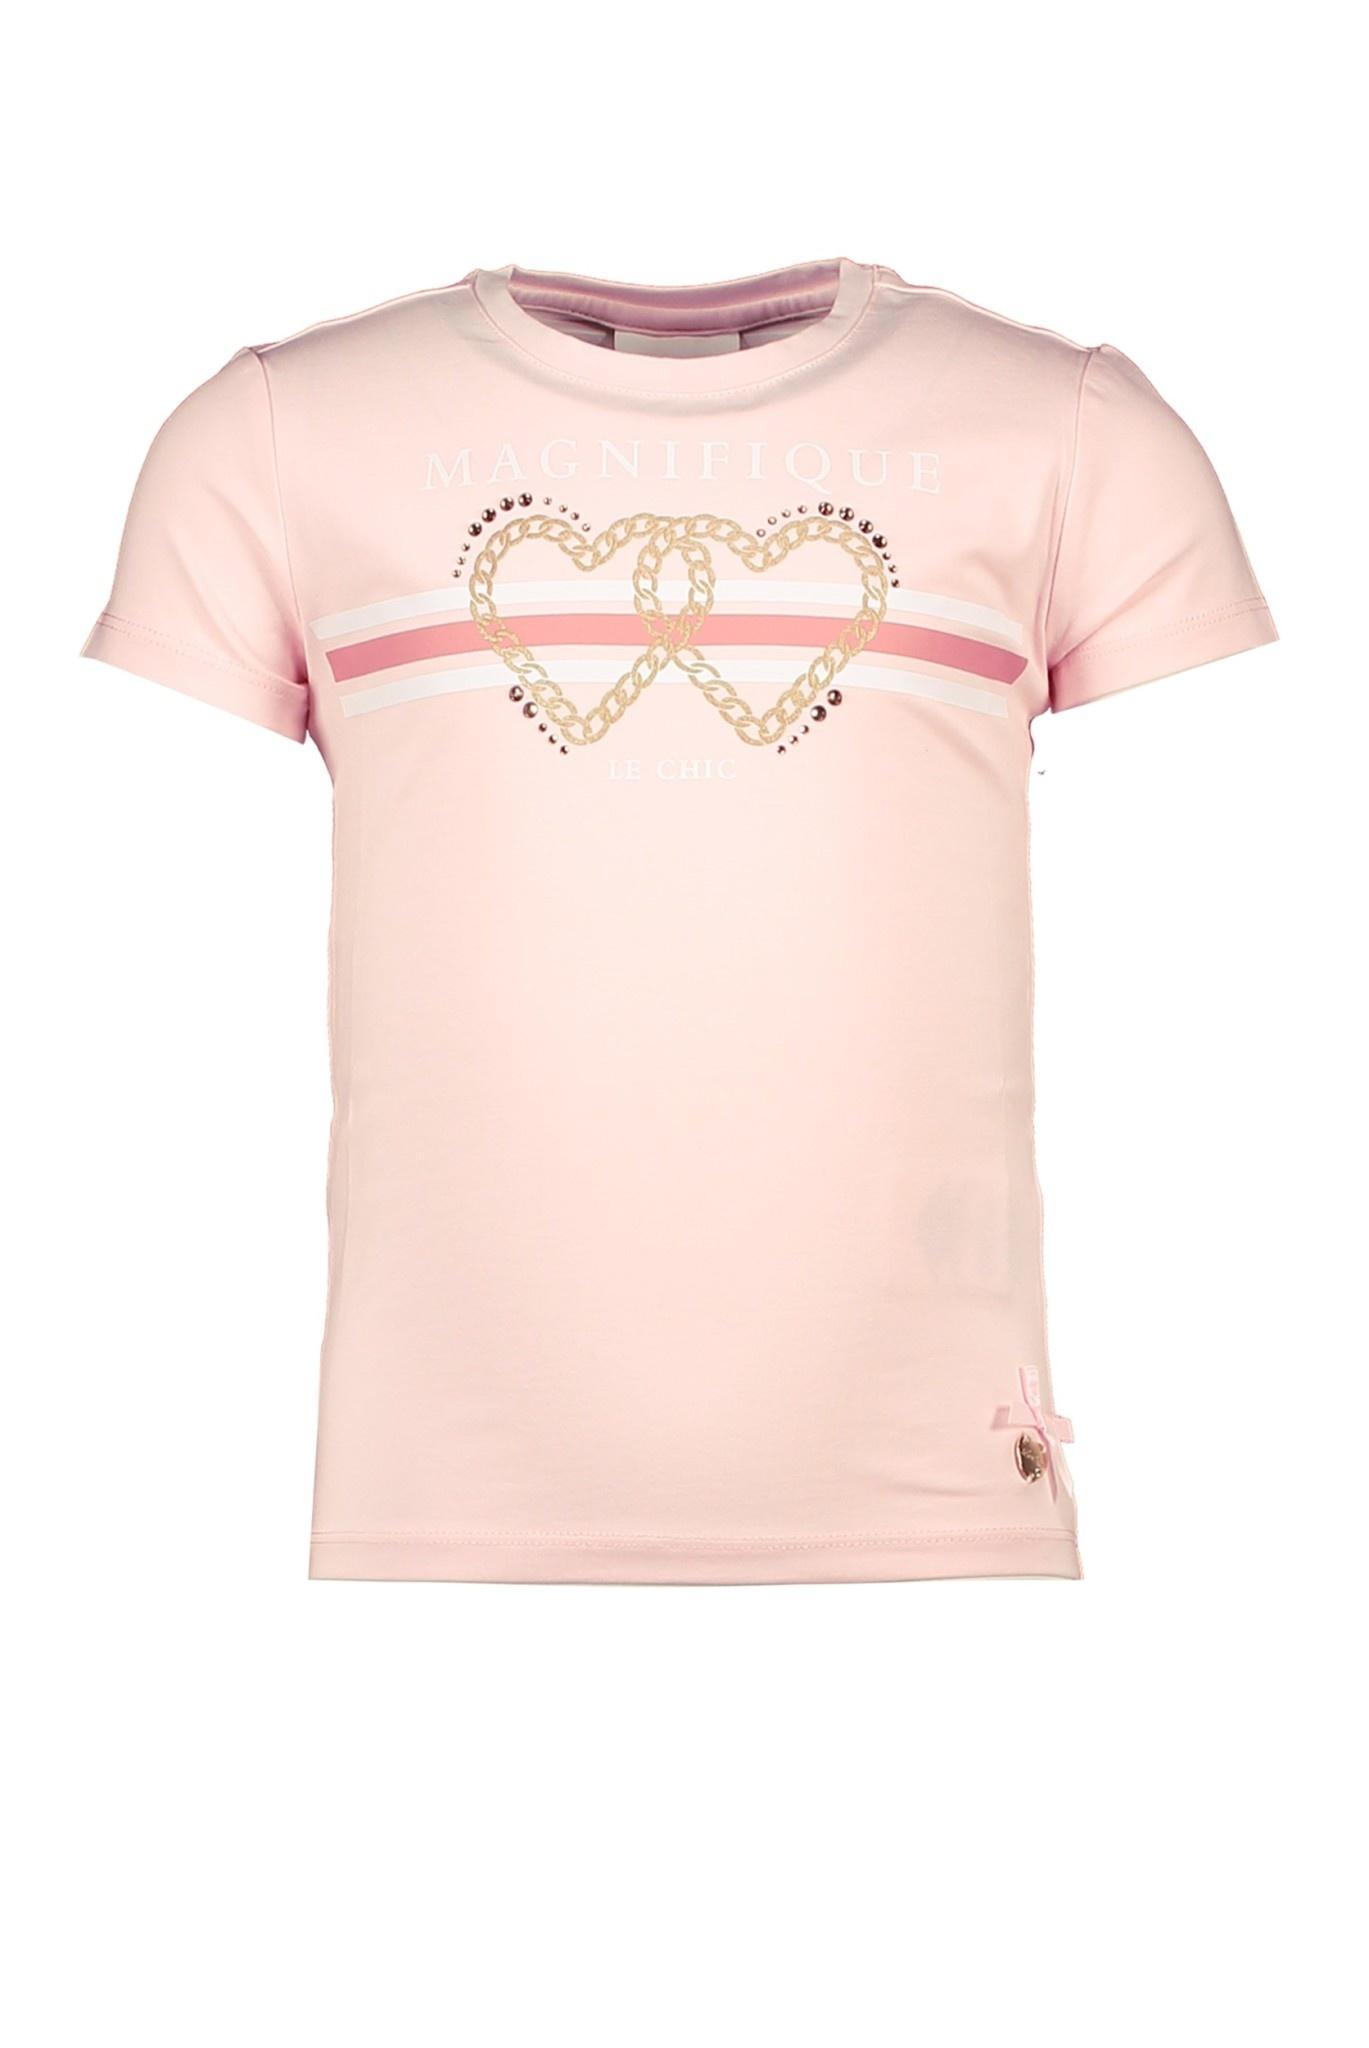 Lechic LeChic Pink Chain Heart T-Shirt